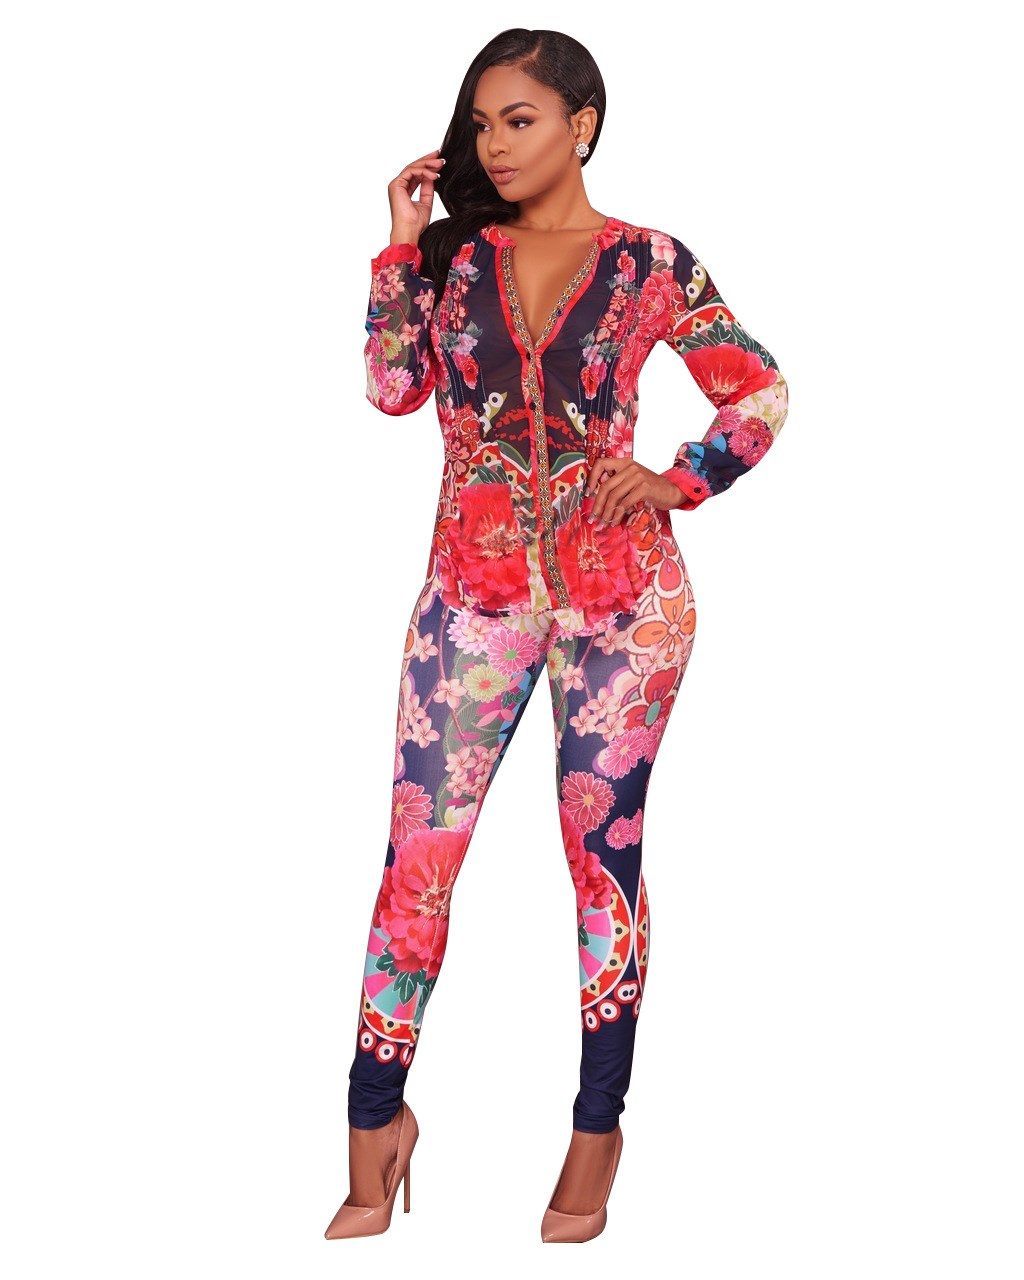 Spring Women 2 Piece Set Floral Printed Long Sleeve Shirt   Skinny Long Pants Women Casual Night Club Set